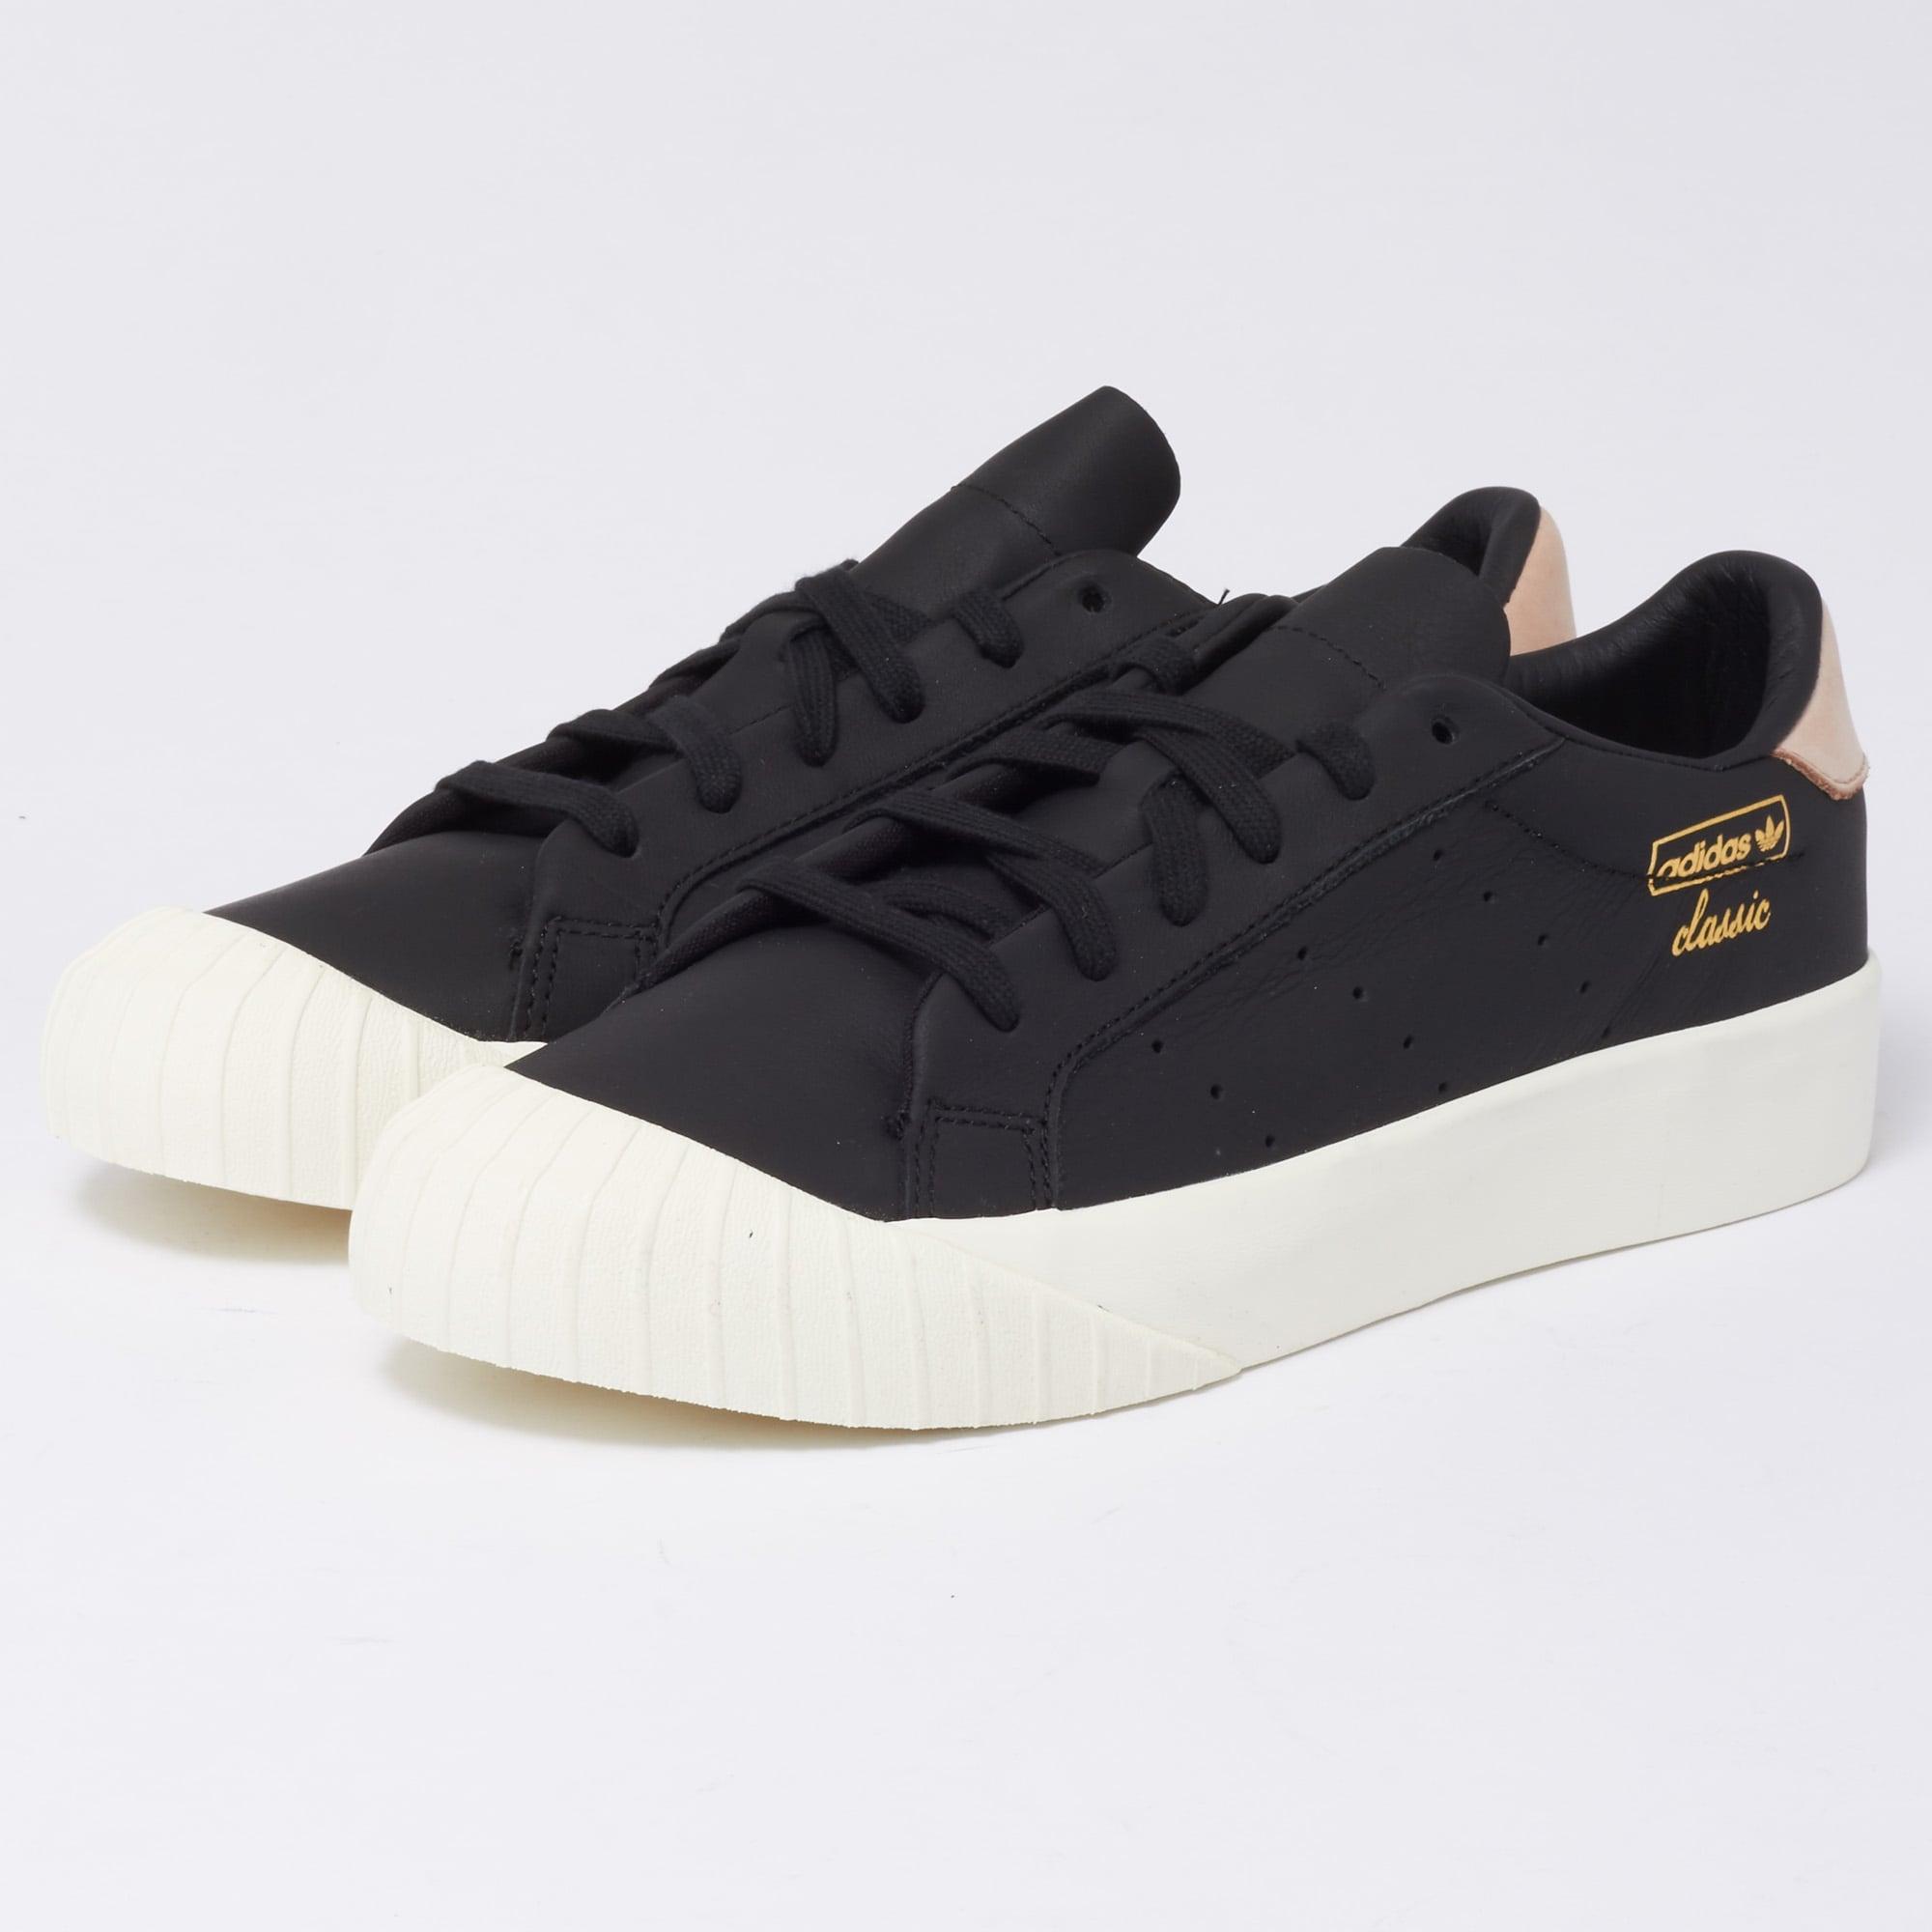 868c272f67a2 Adidas Originals Everyn Trainers (Black   Pink) at Dandy Fellow